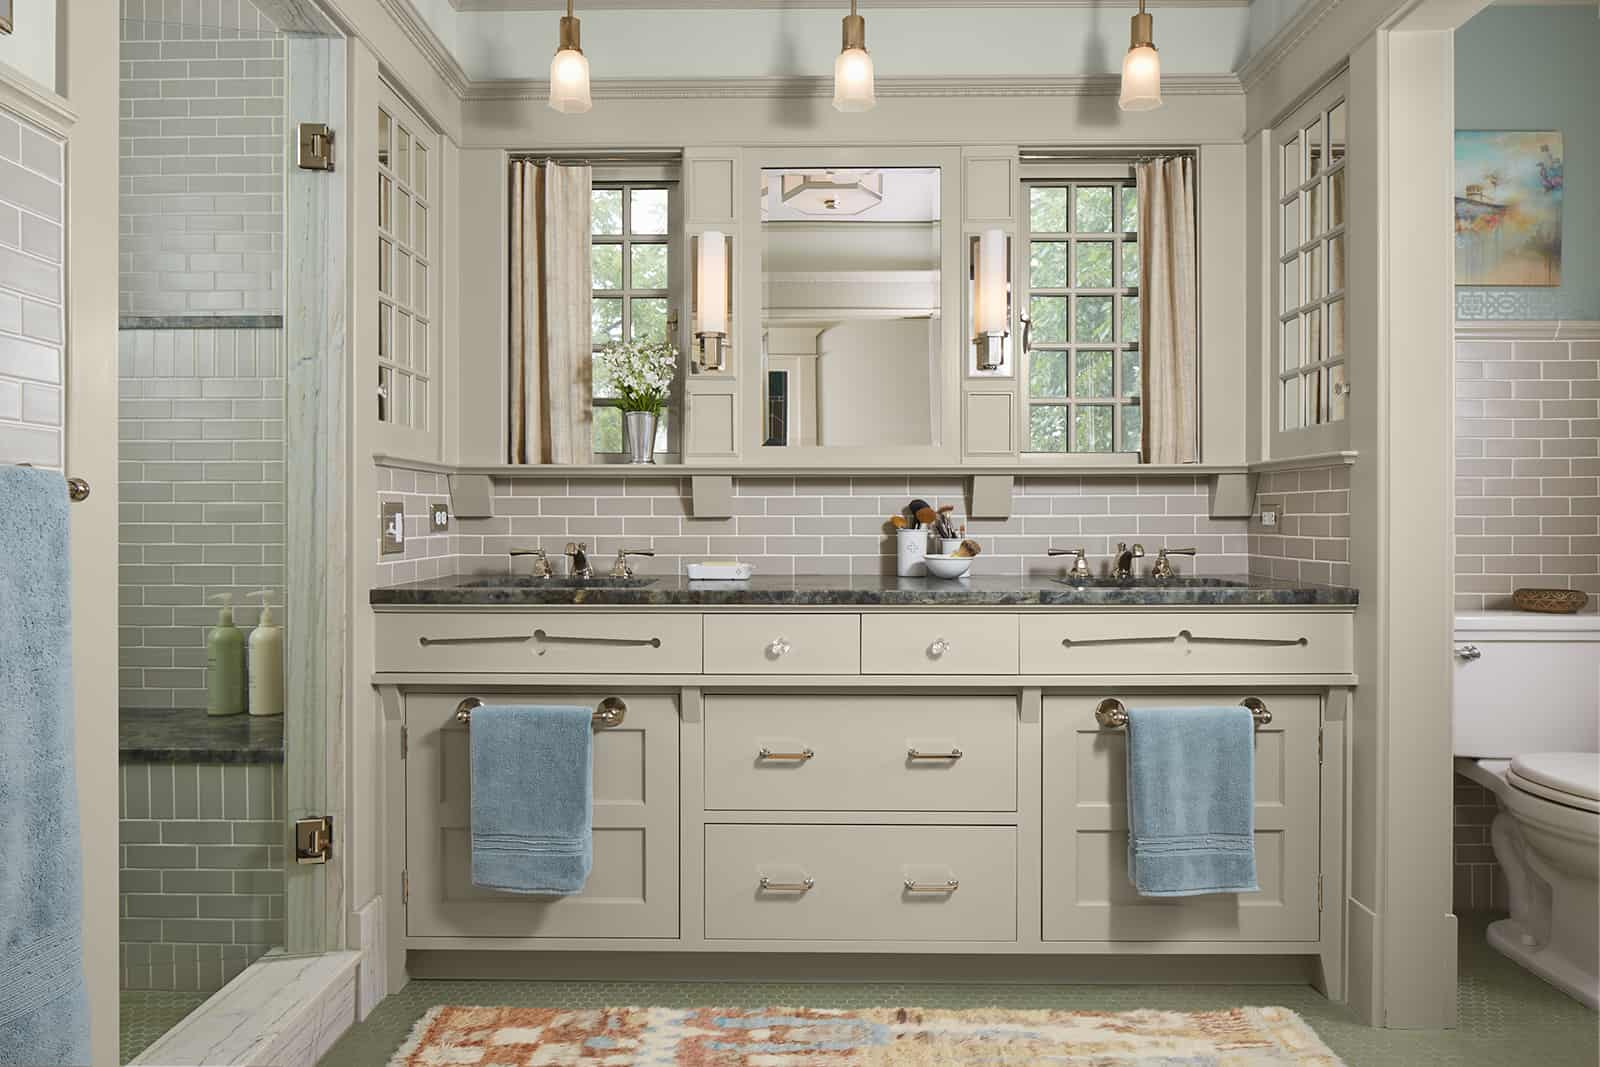 Master bathroom overview and custom vanity